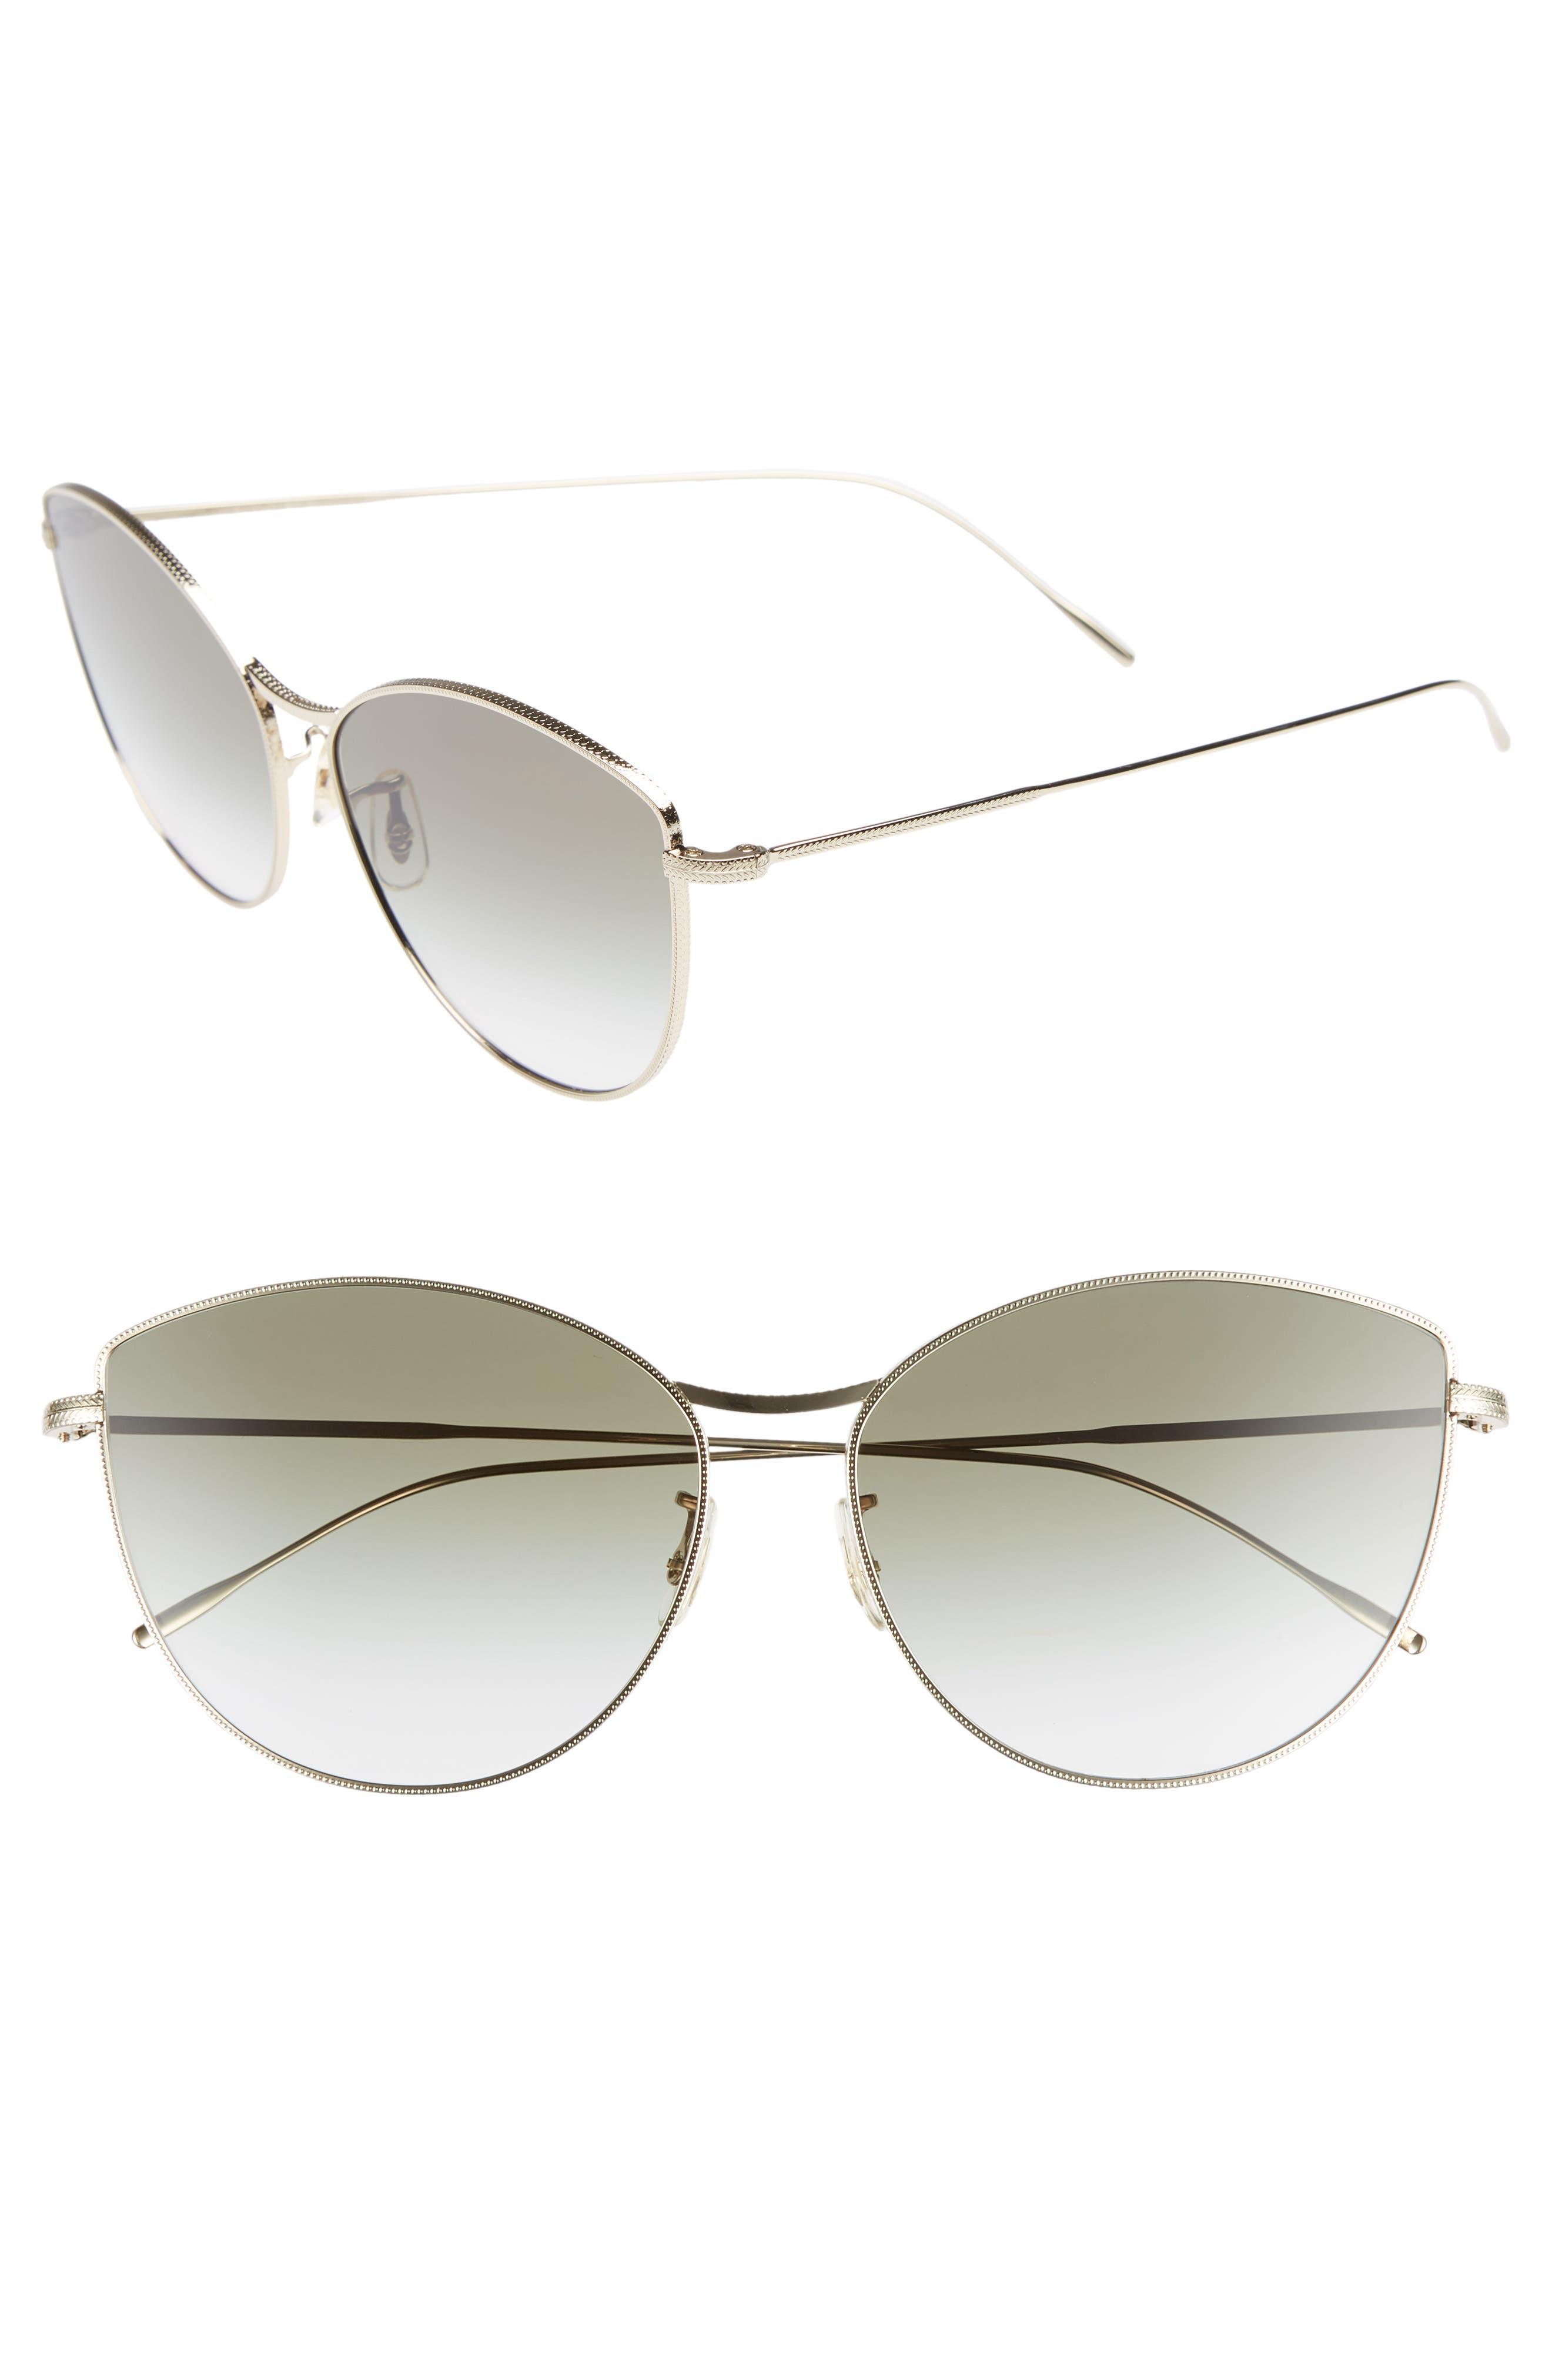 Rayette 60mm Cat Eye Sunglasses,                         Main,                         color, SOFT GOLD OLIVE